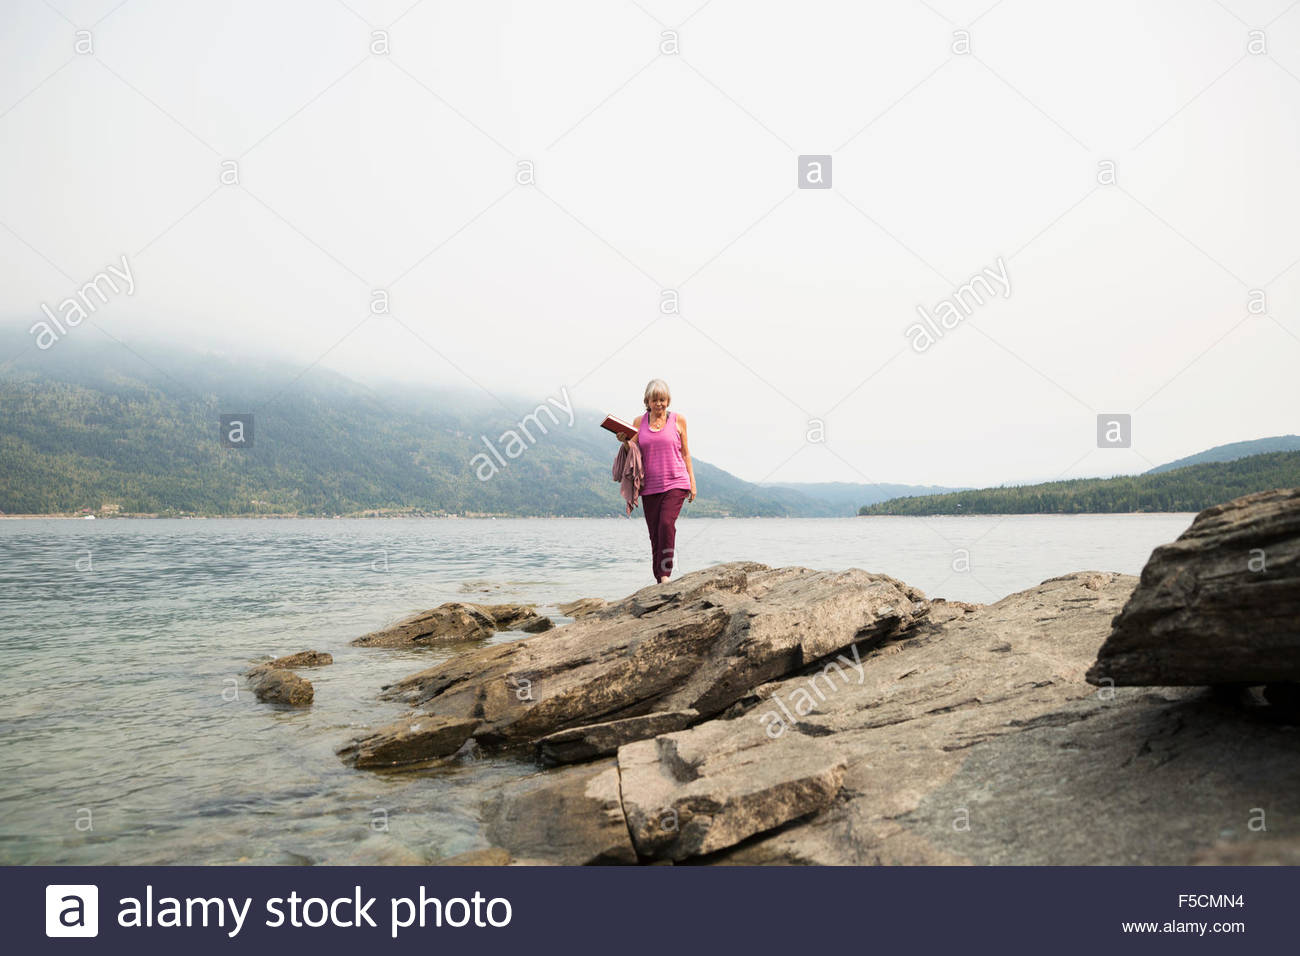 Woman walking on rocks at lakeside Photo Stock